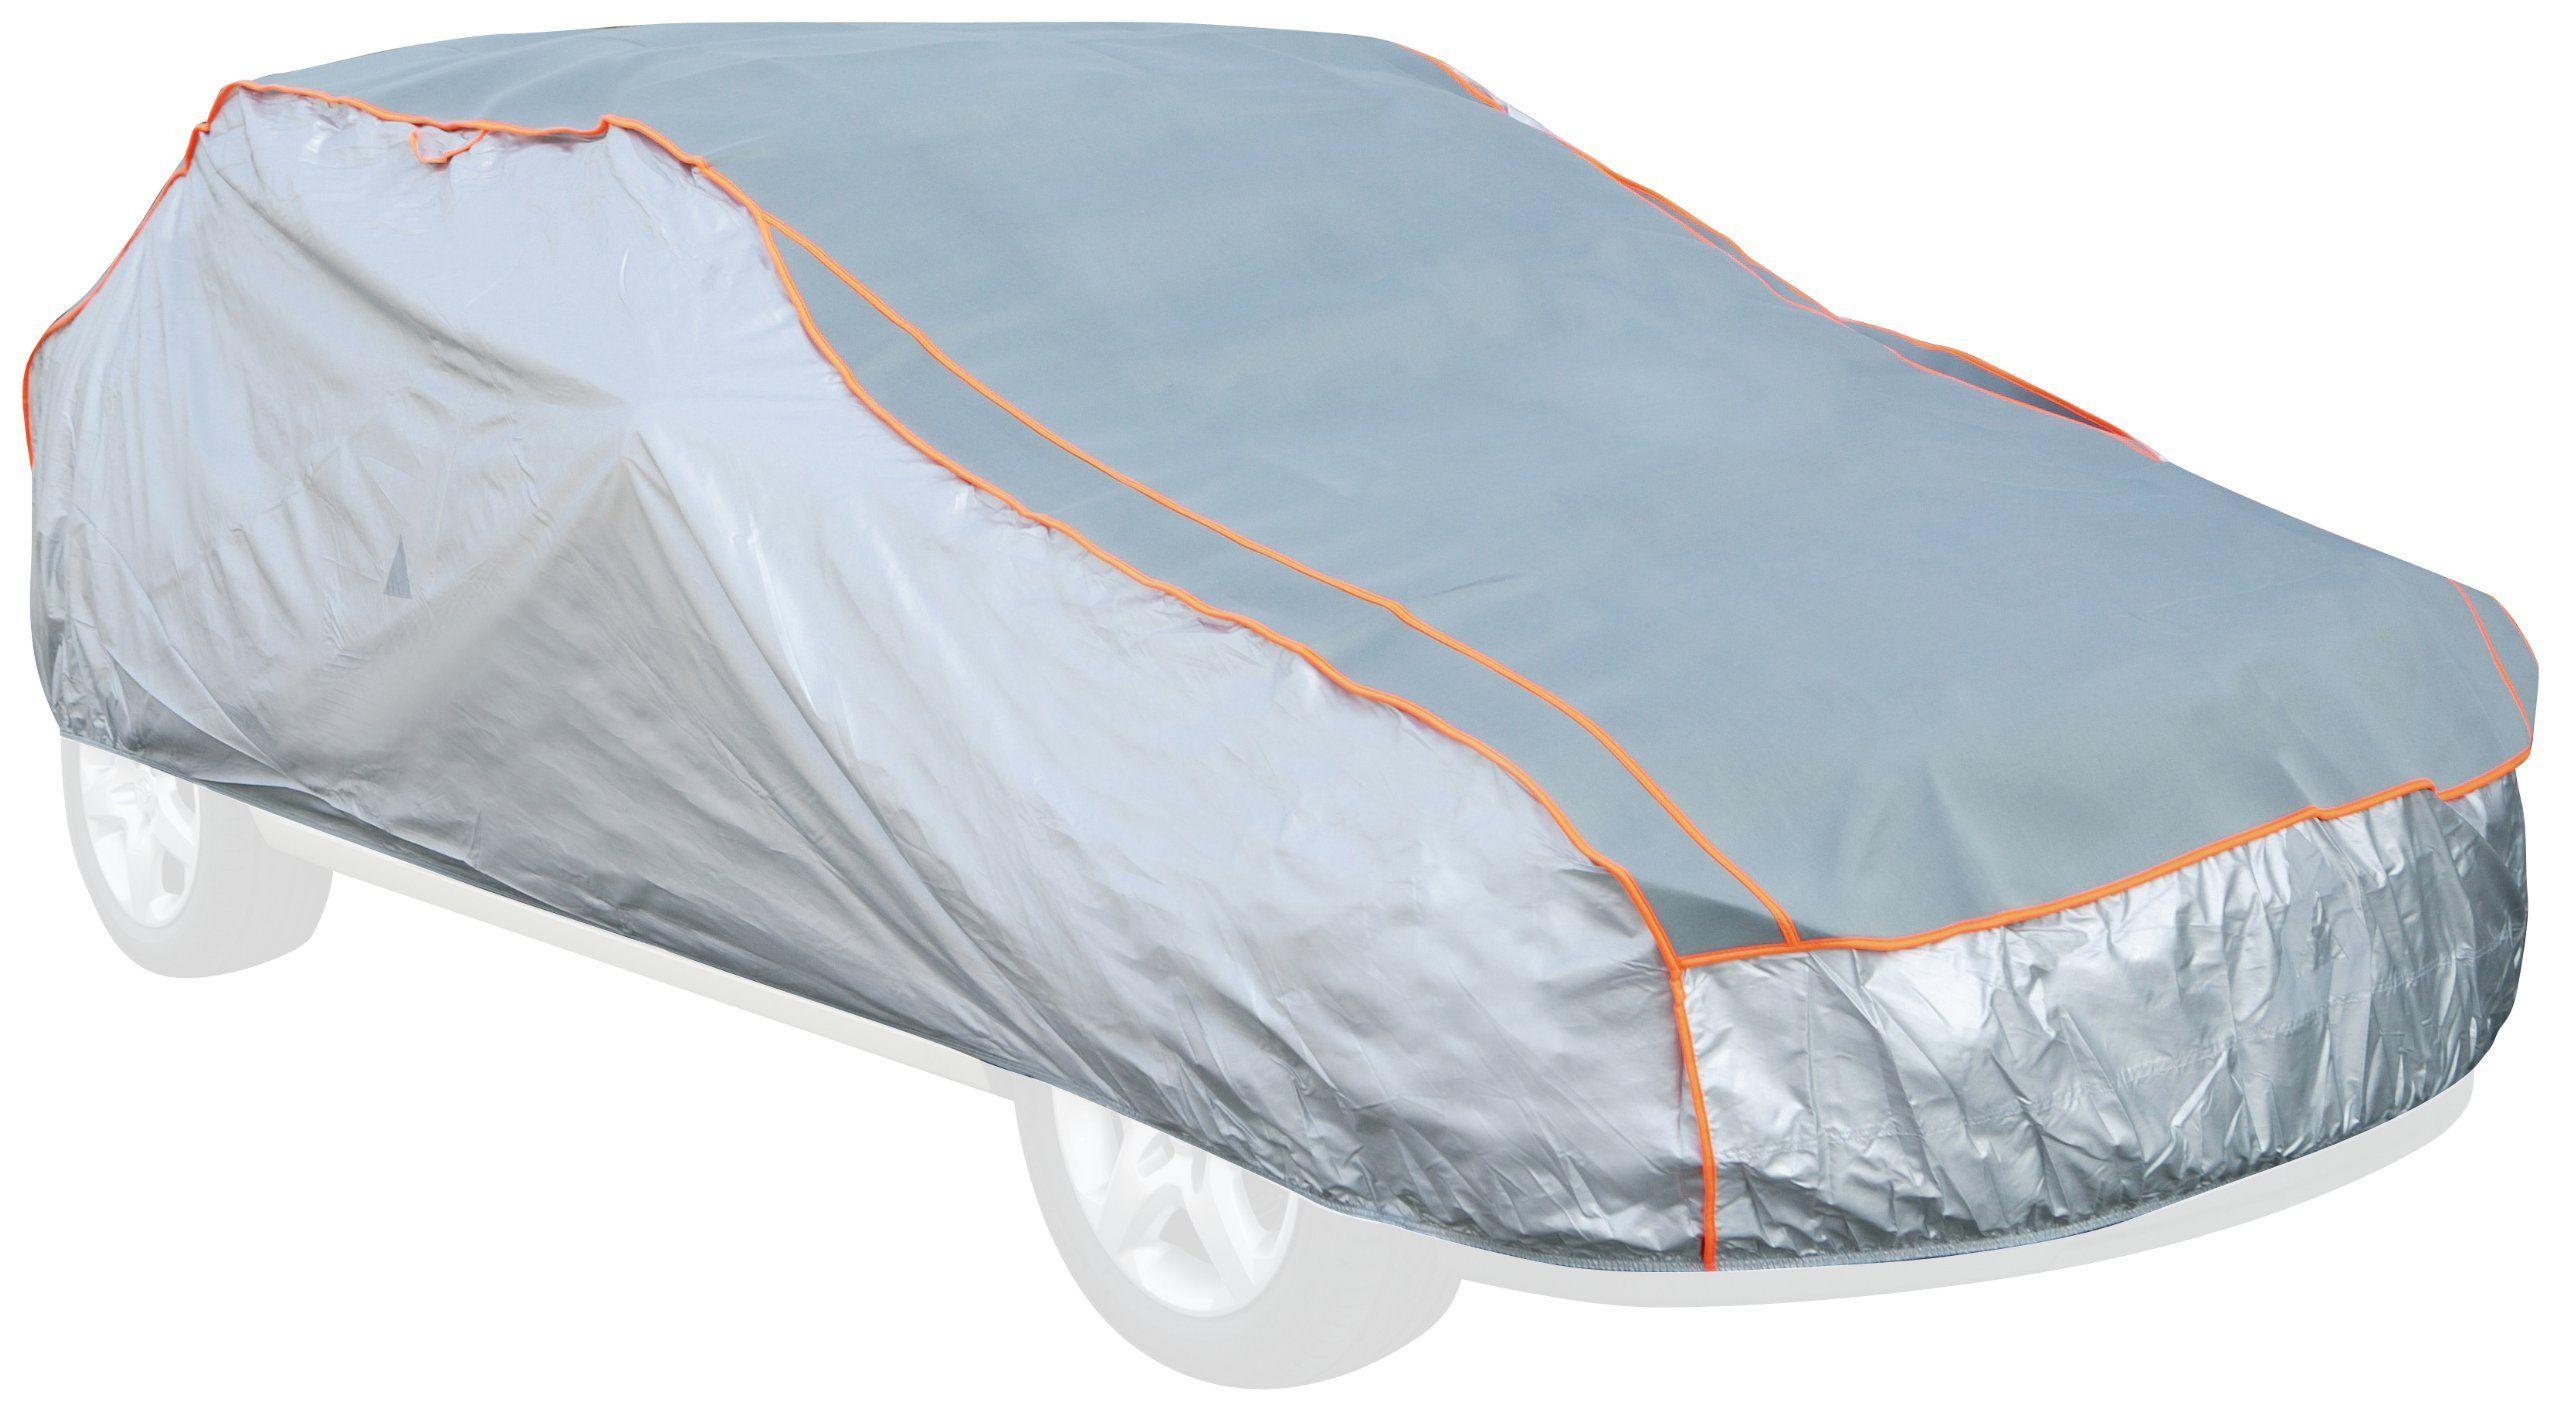 Unitec 75847 Hail Protection Vehicle Cover Size M * Click